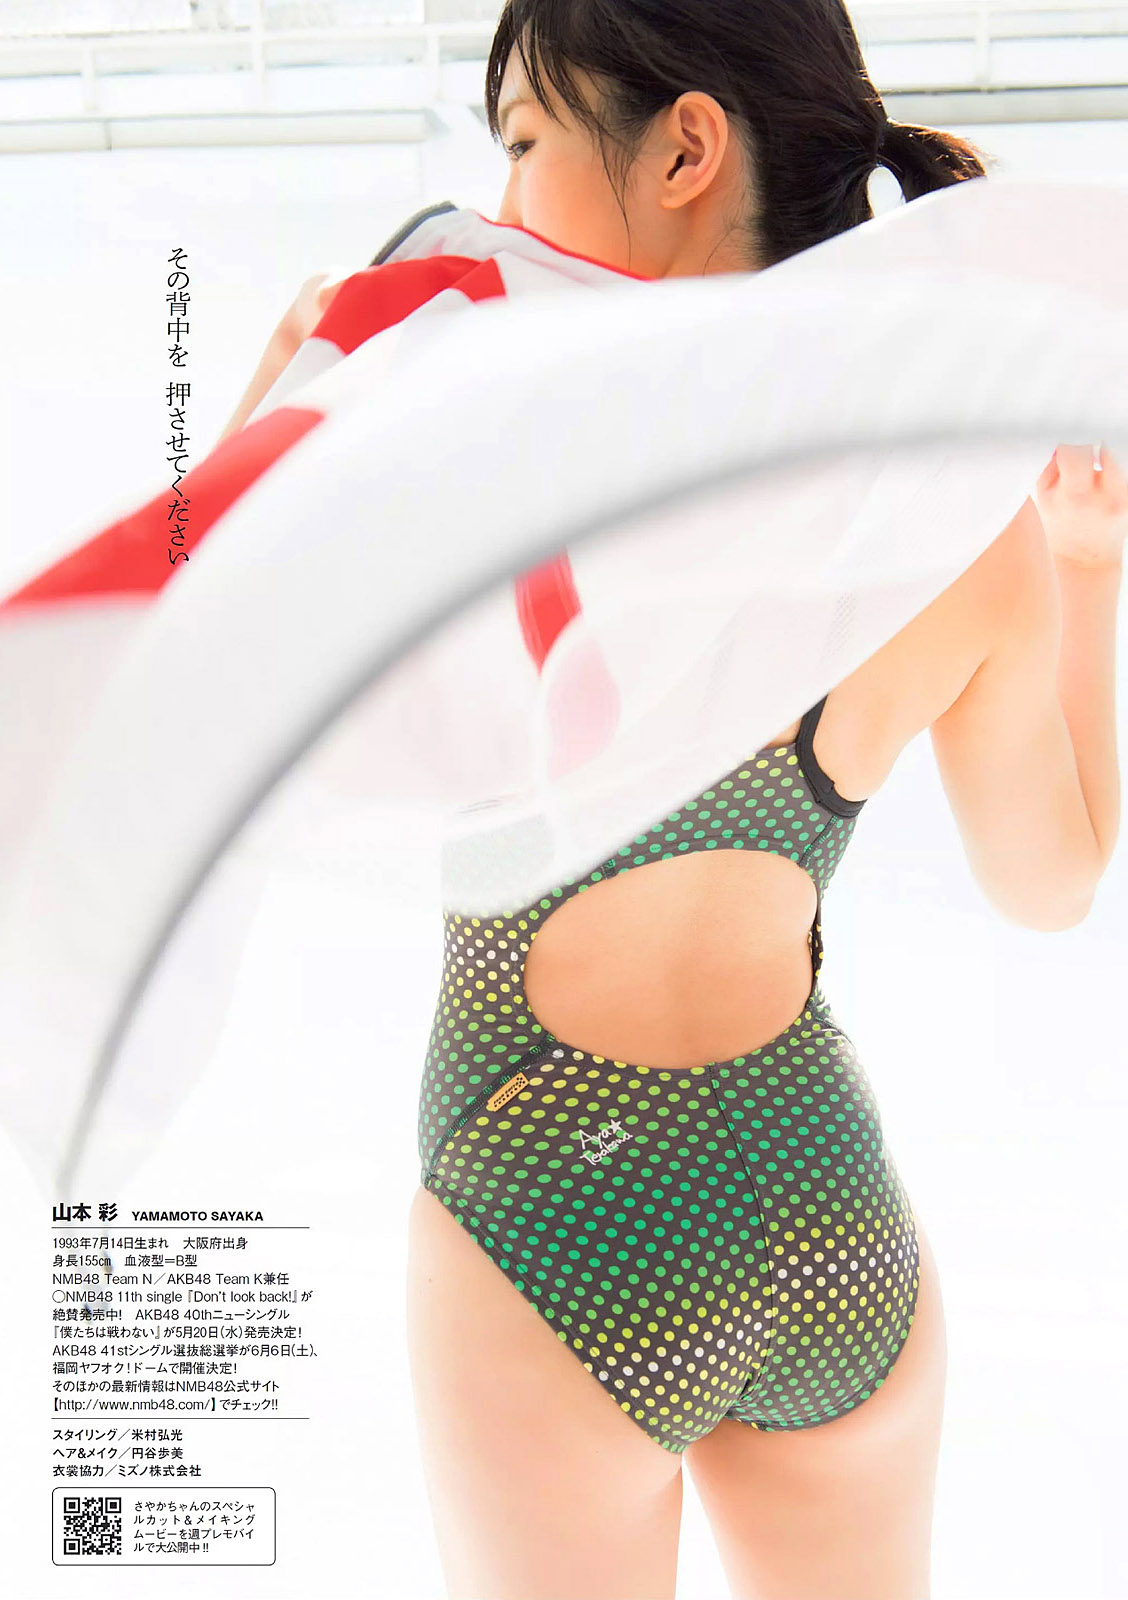 SYamamoto WPB 150518 07.jpg